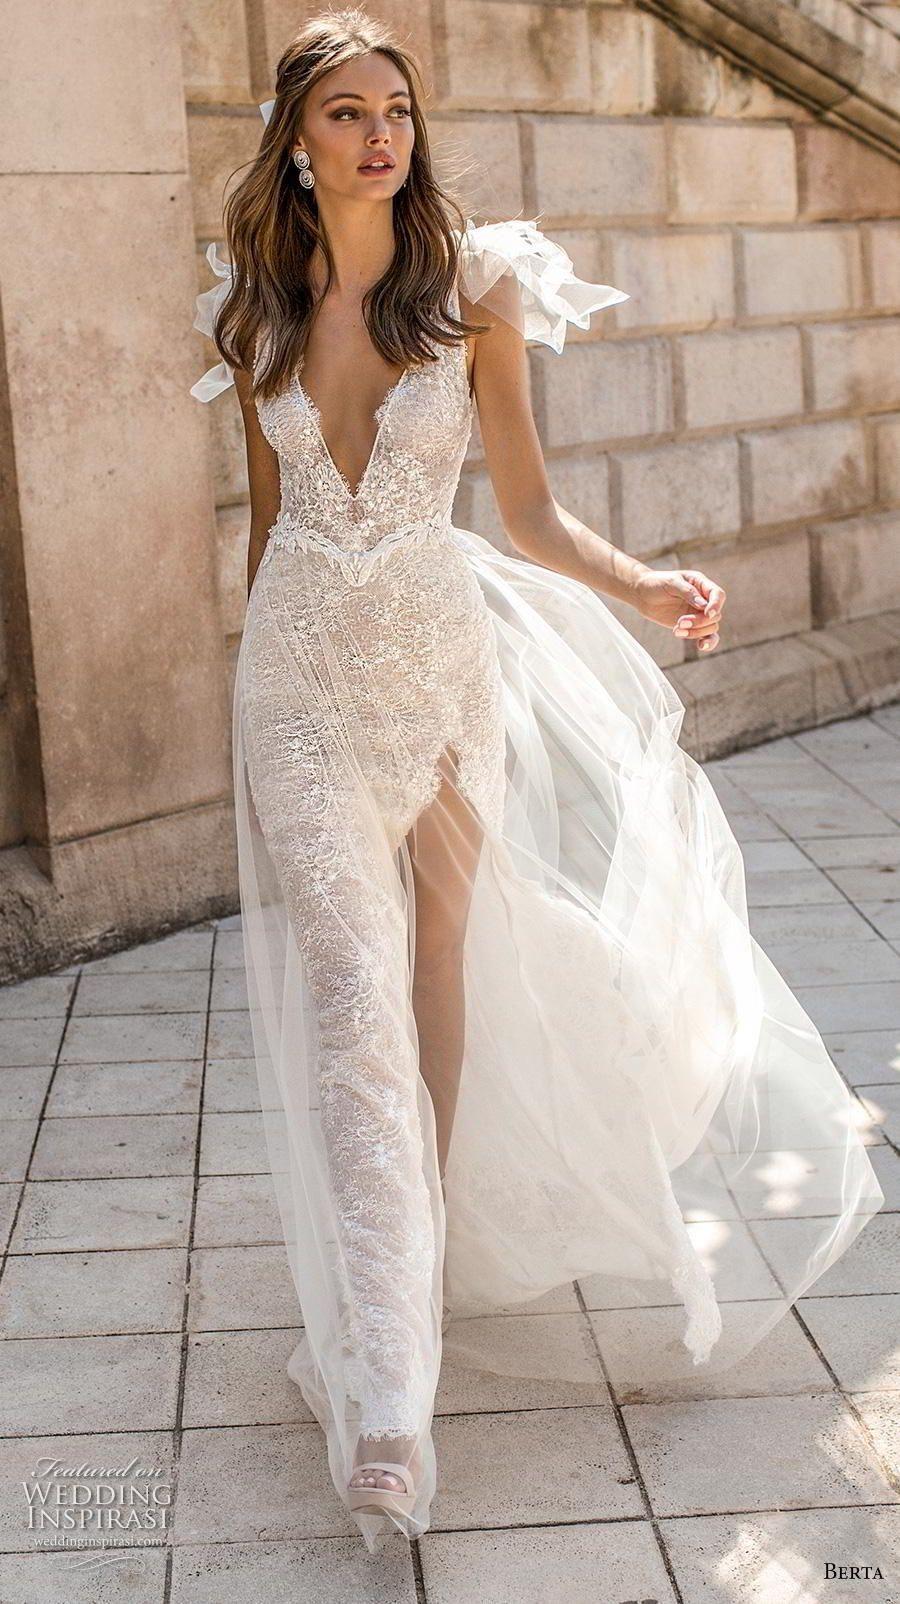 White Boho Bohemian Wedding Dress Designer Lace Very Pretty